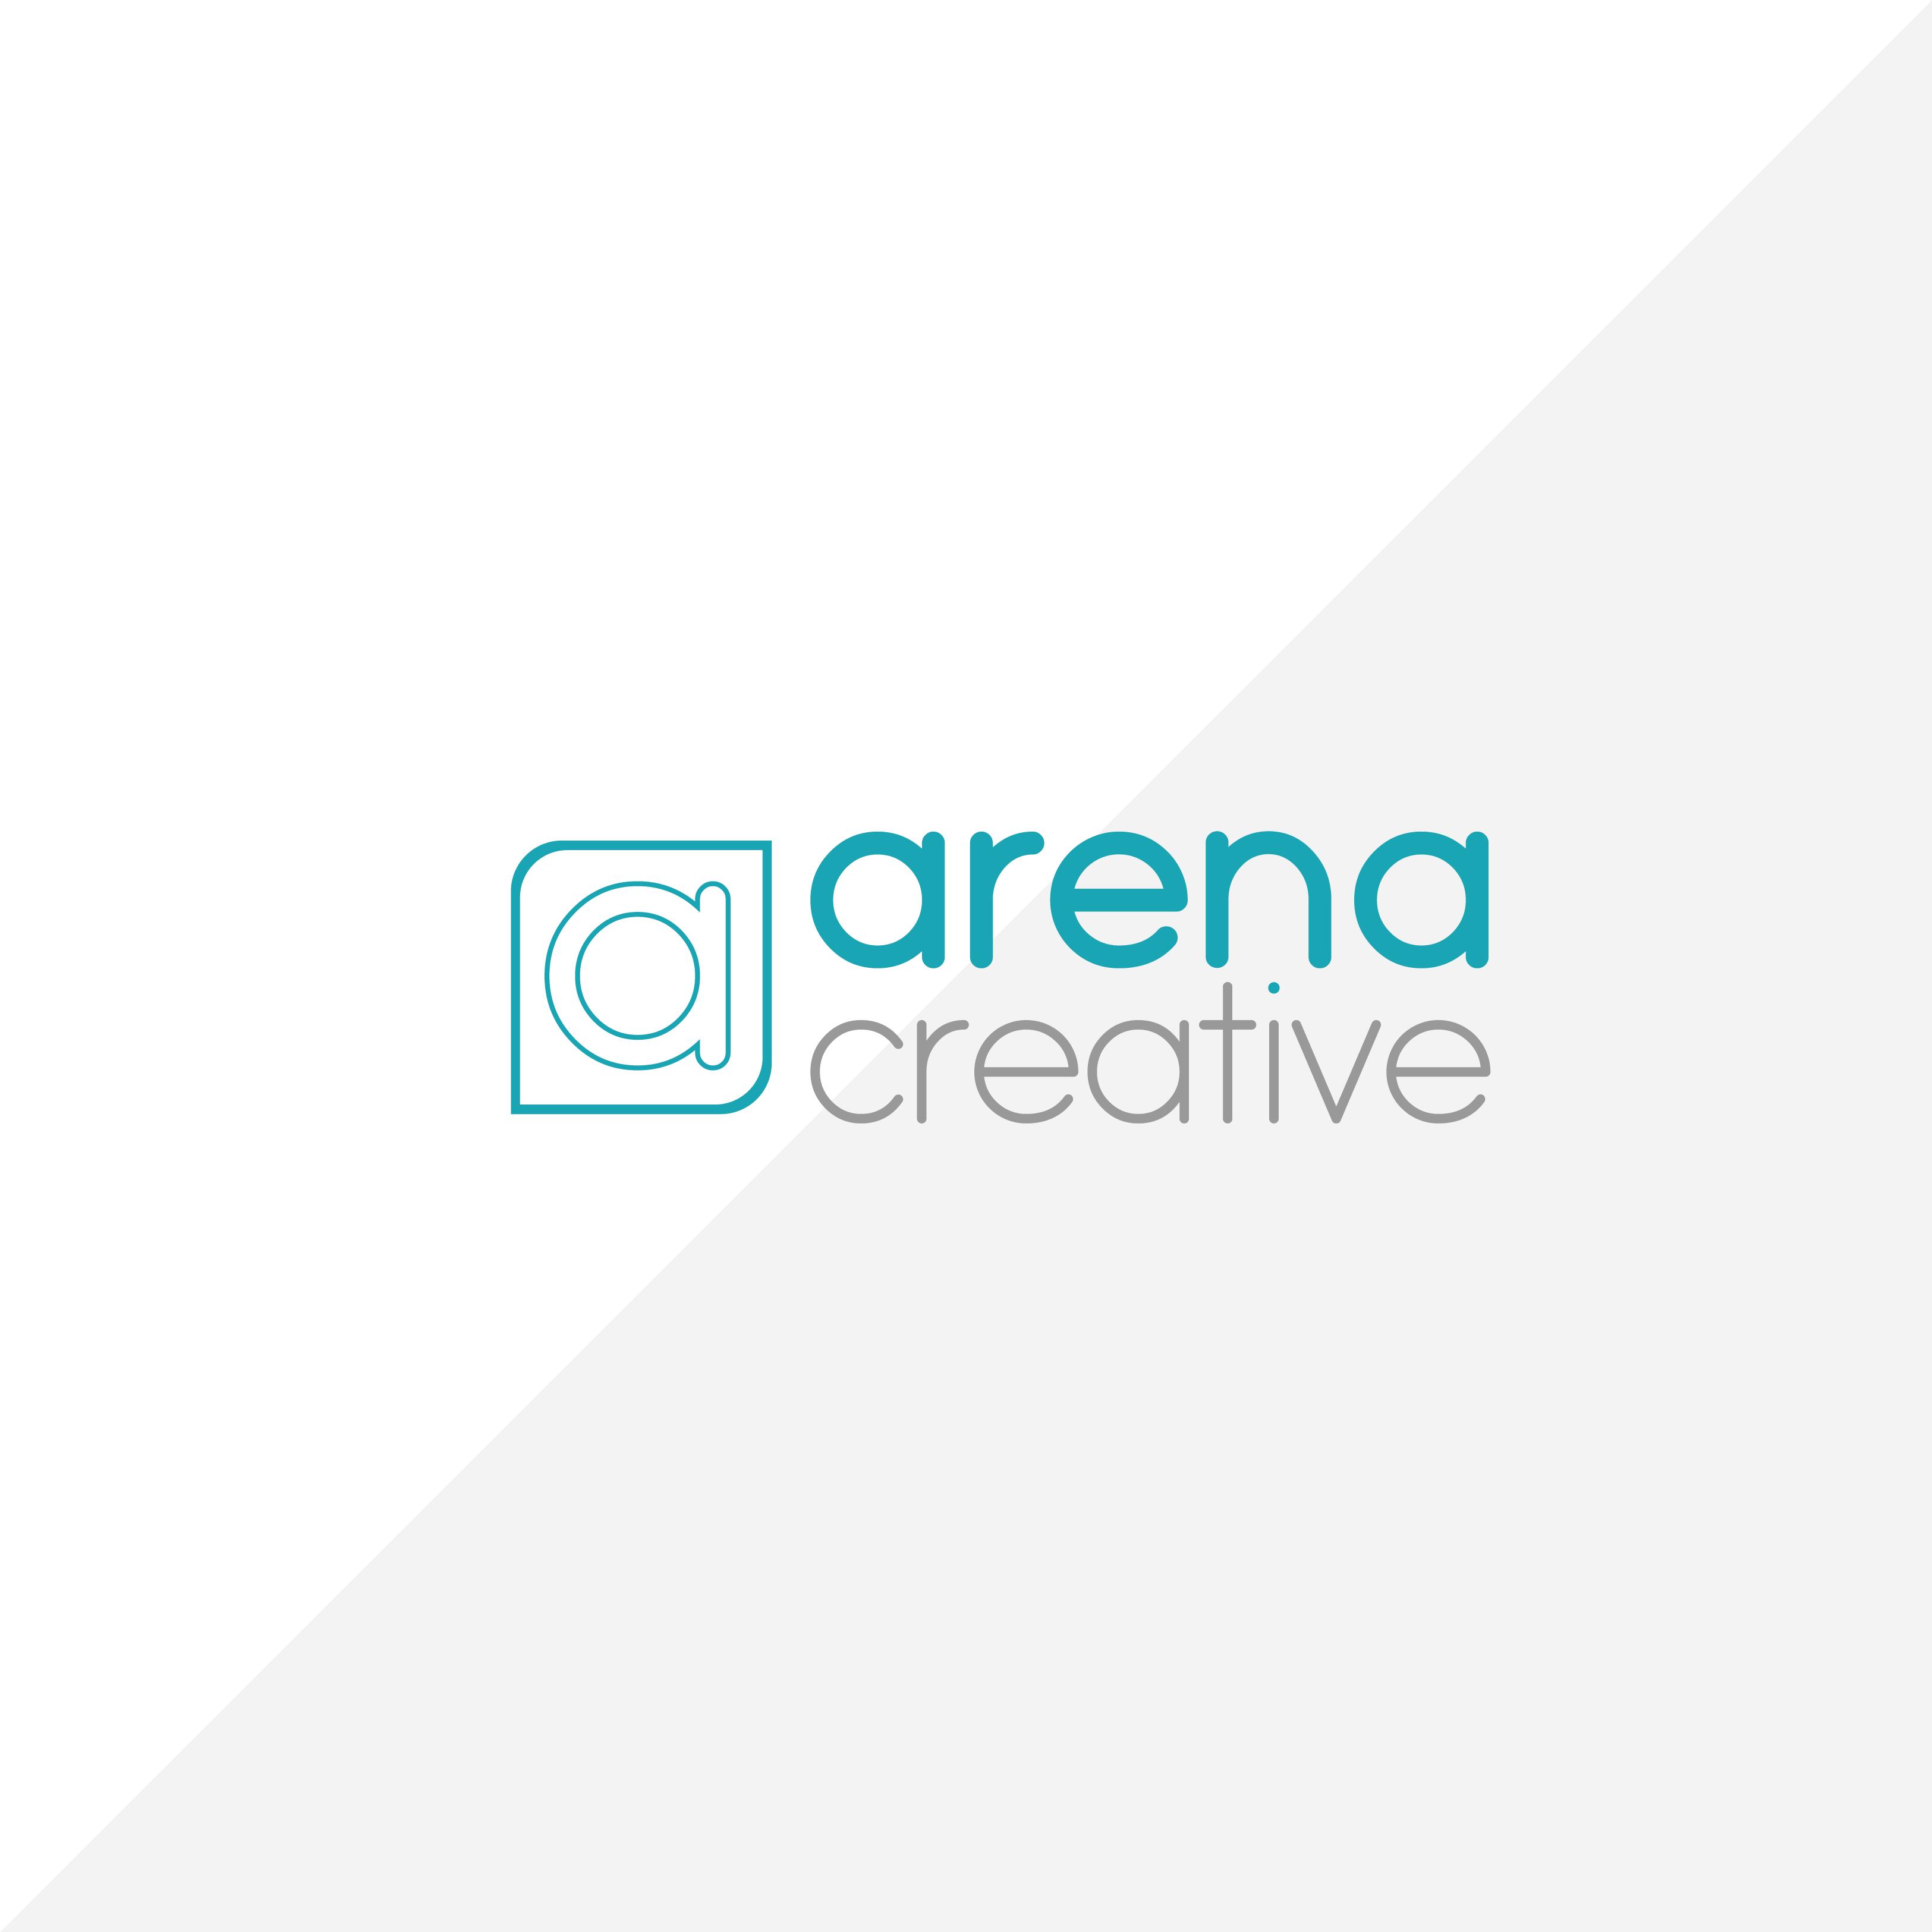 Arena Creative